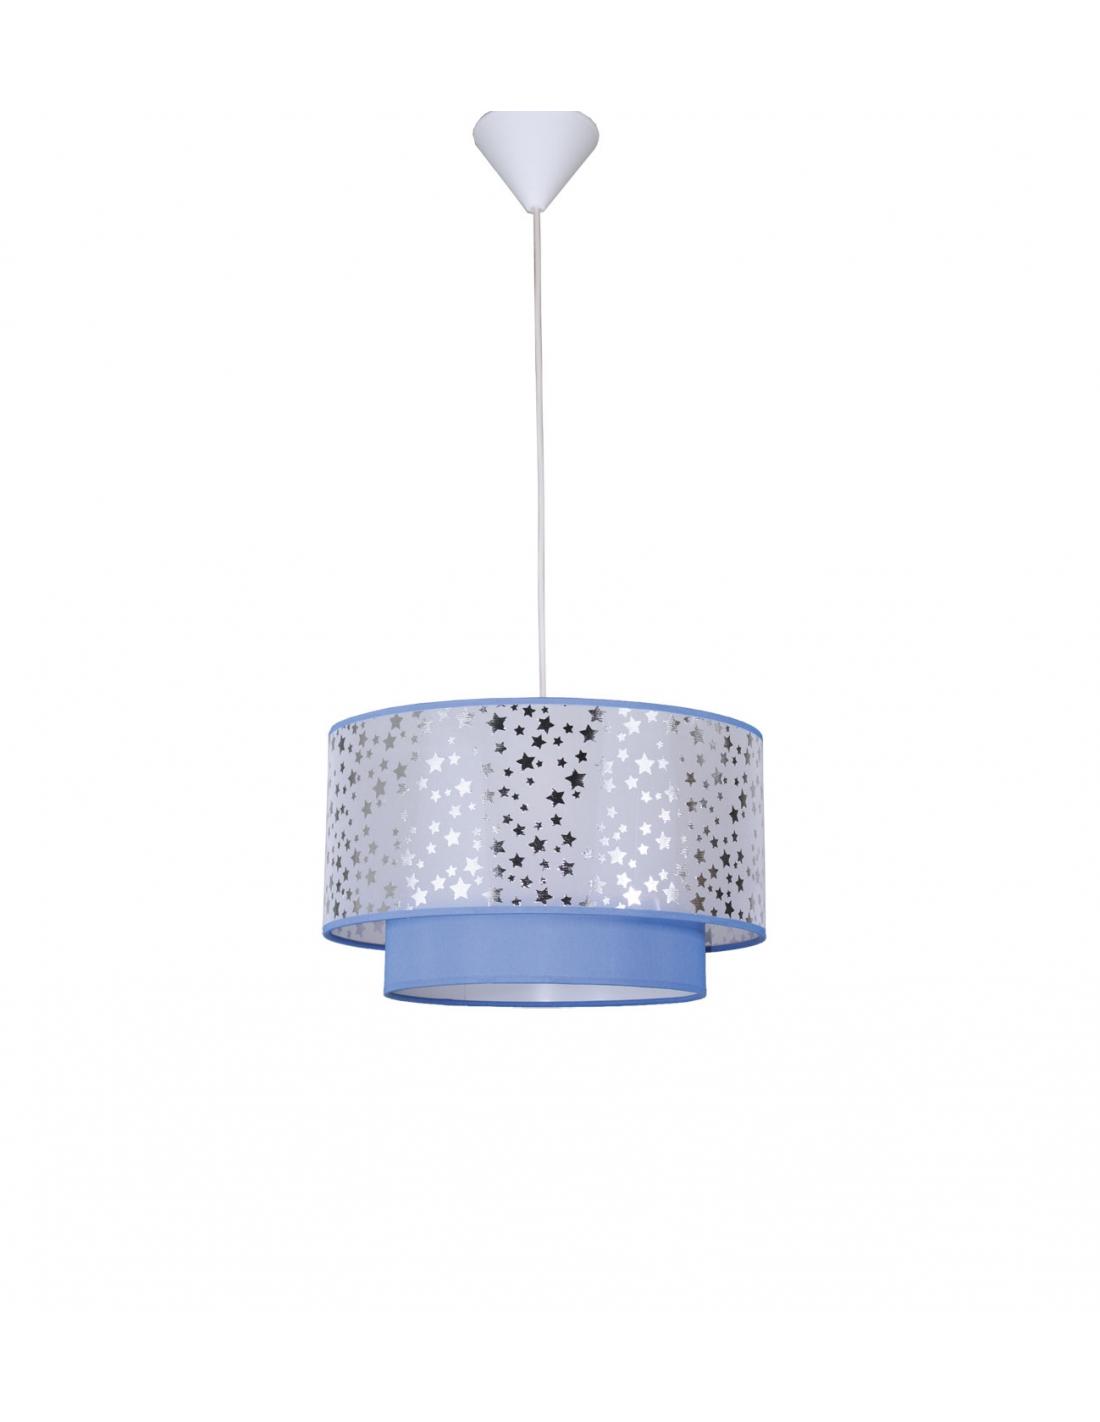 Comprar l mpara de techo infantil destello doble - Comprar lamparas de techo ...